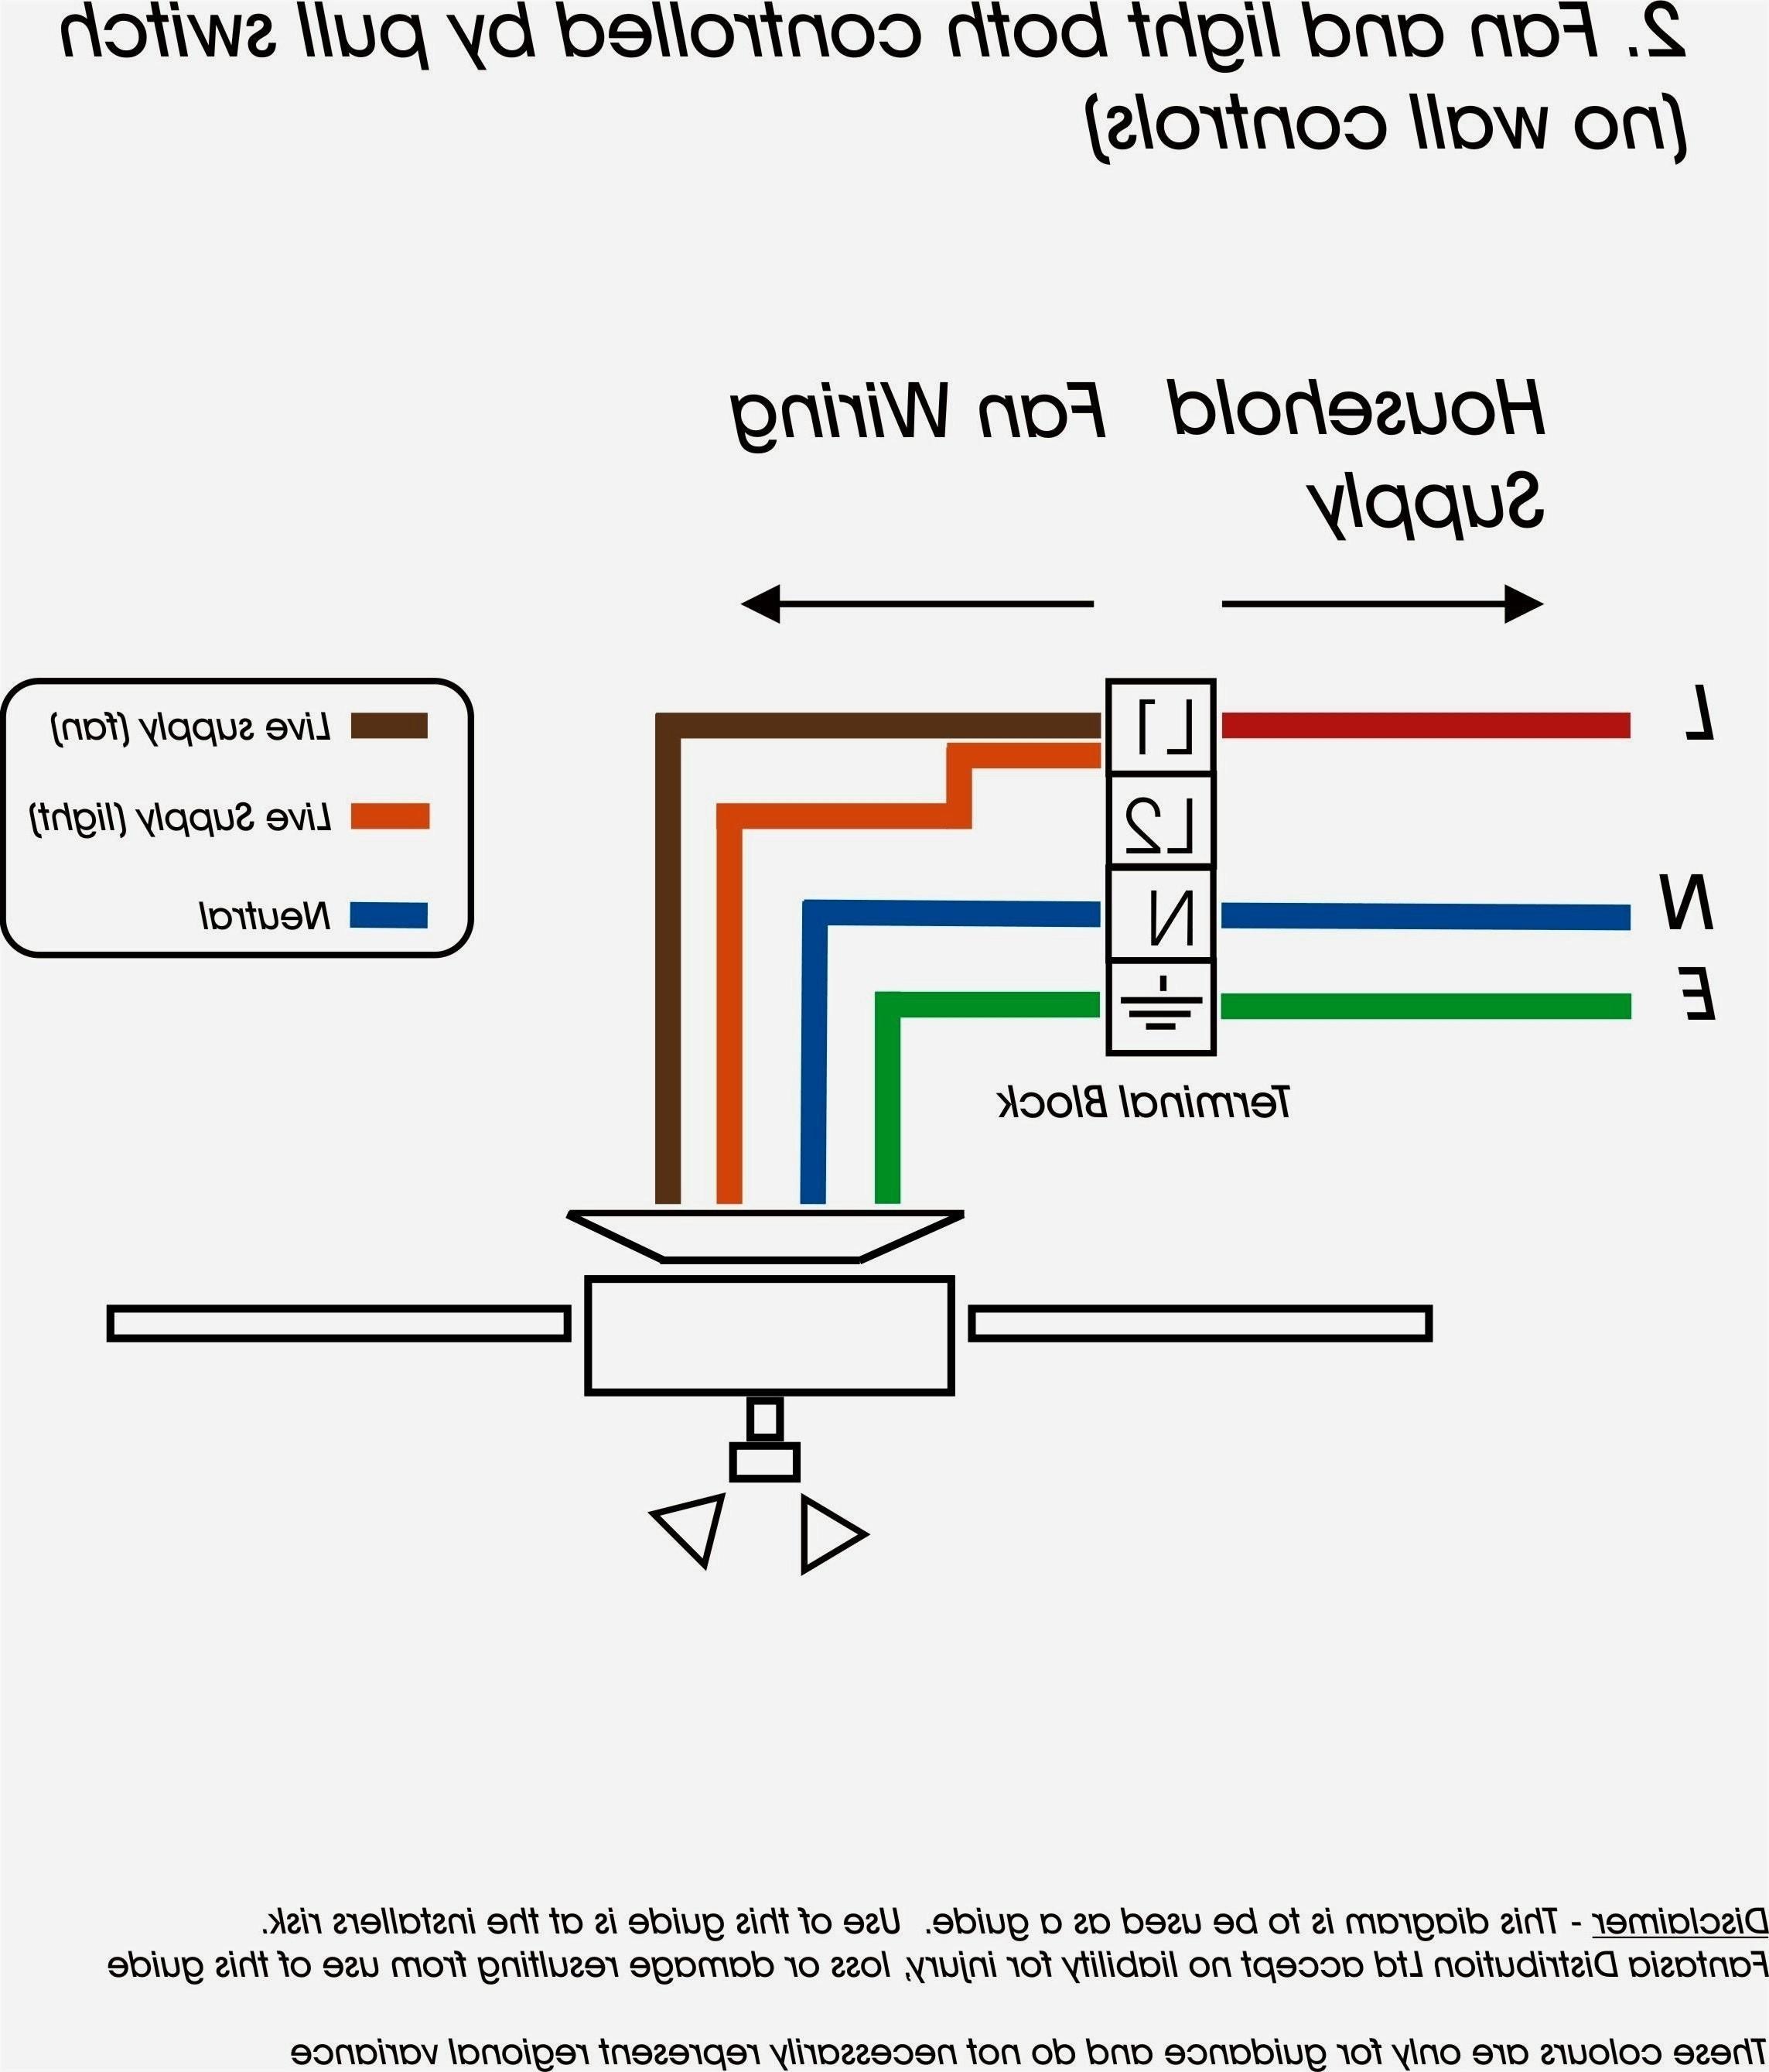 Fluorescent light wiring diagram fan wiring diagram fluorescent light wiring diagram for ballast inspirational wiring light ballast wiring diagrams 2 fluorescent light wiring diagram fan asfbconference2016 Choice Image